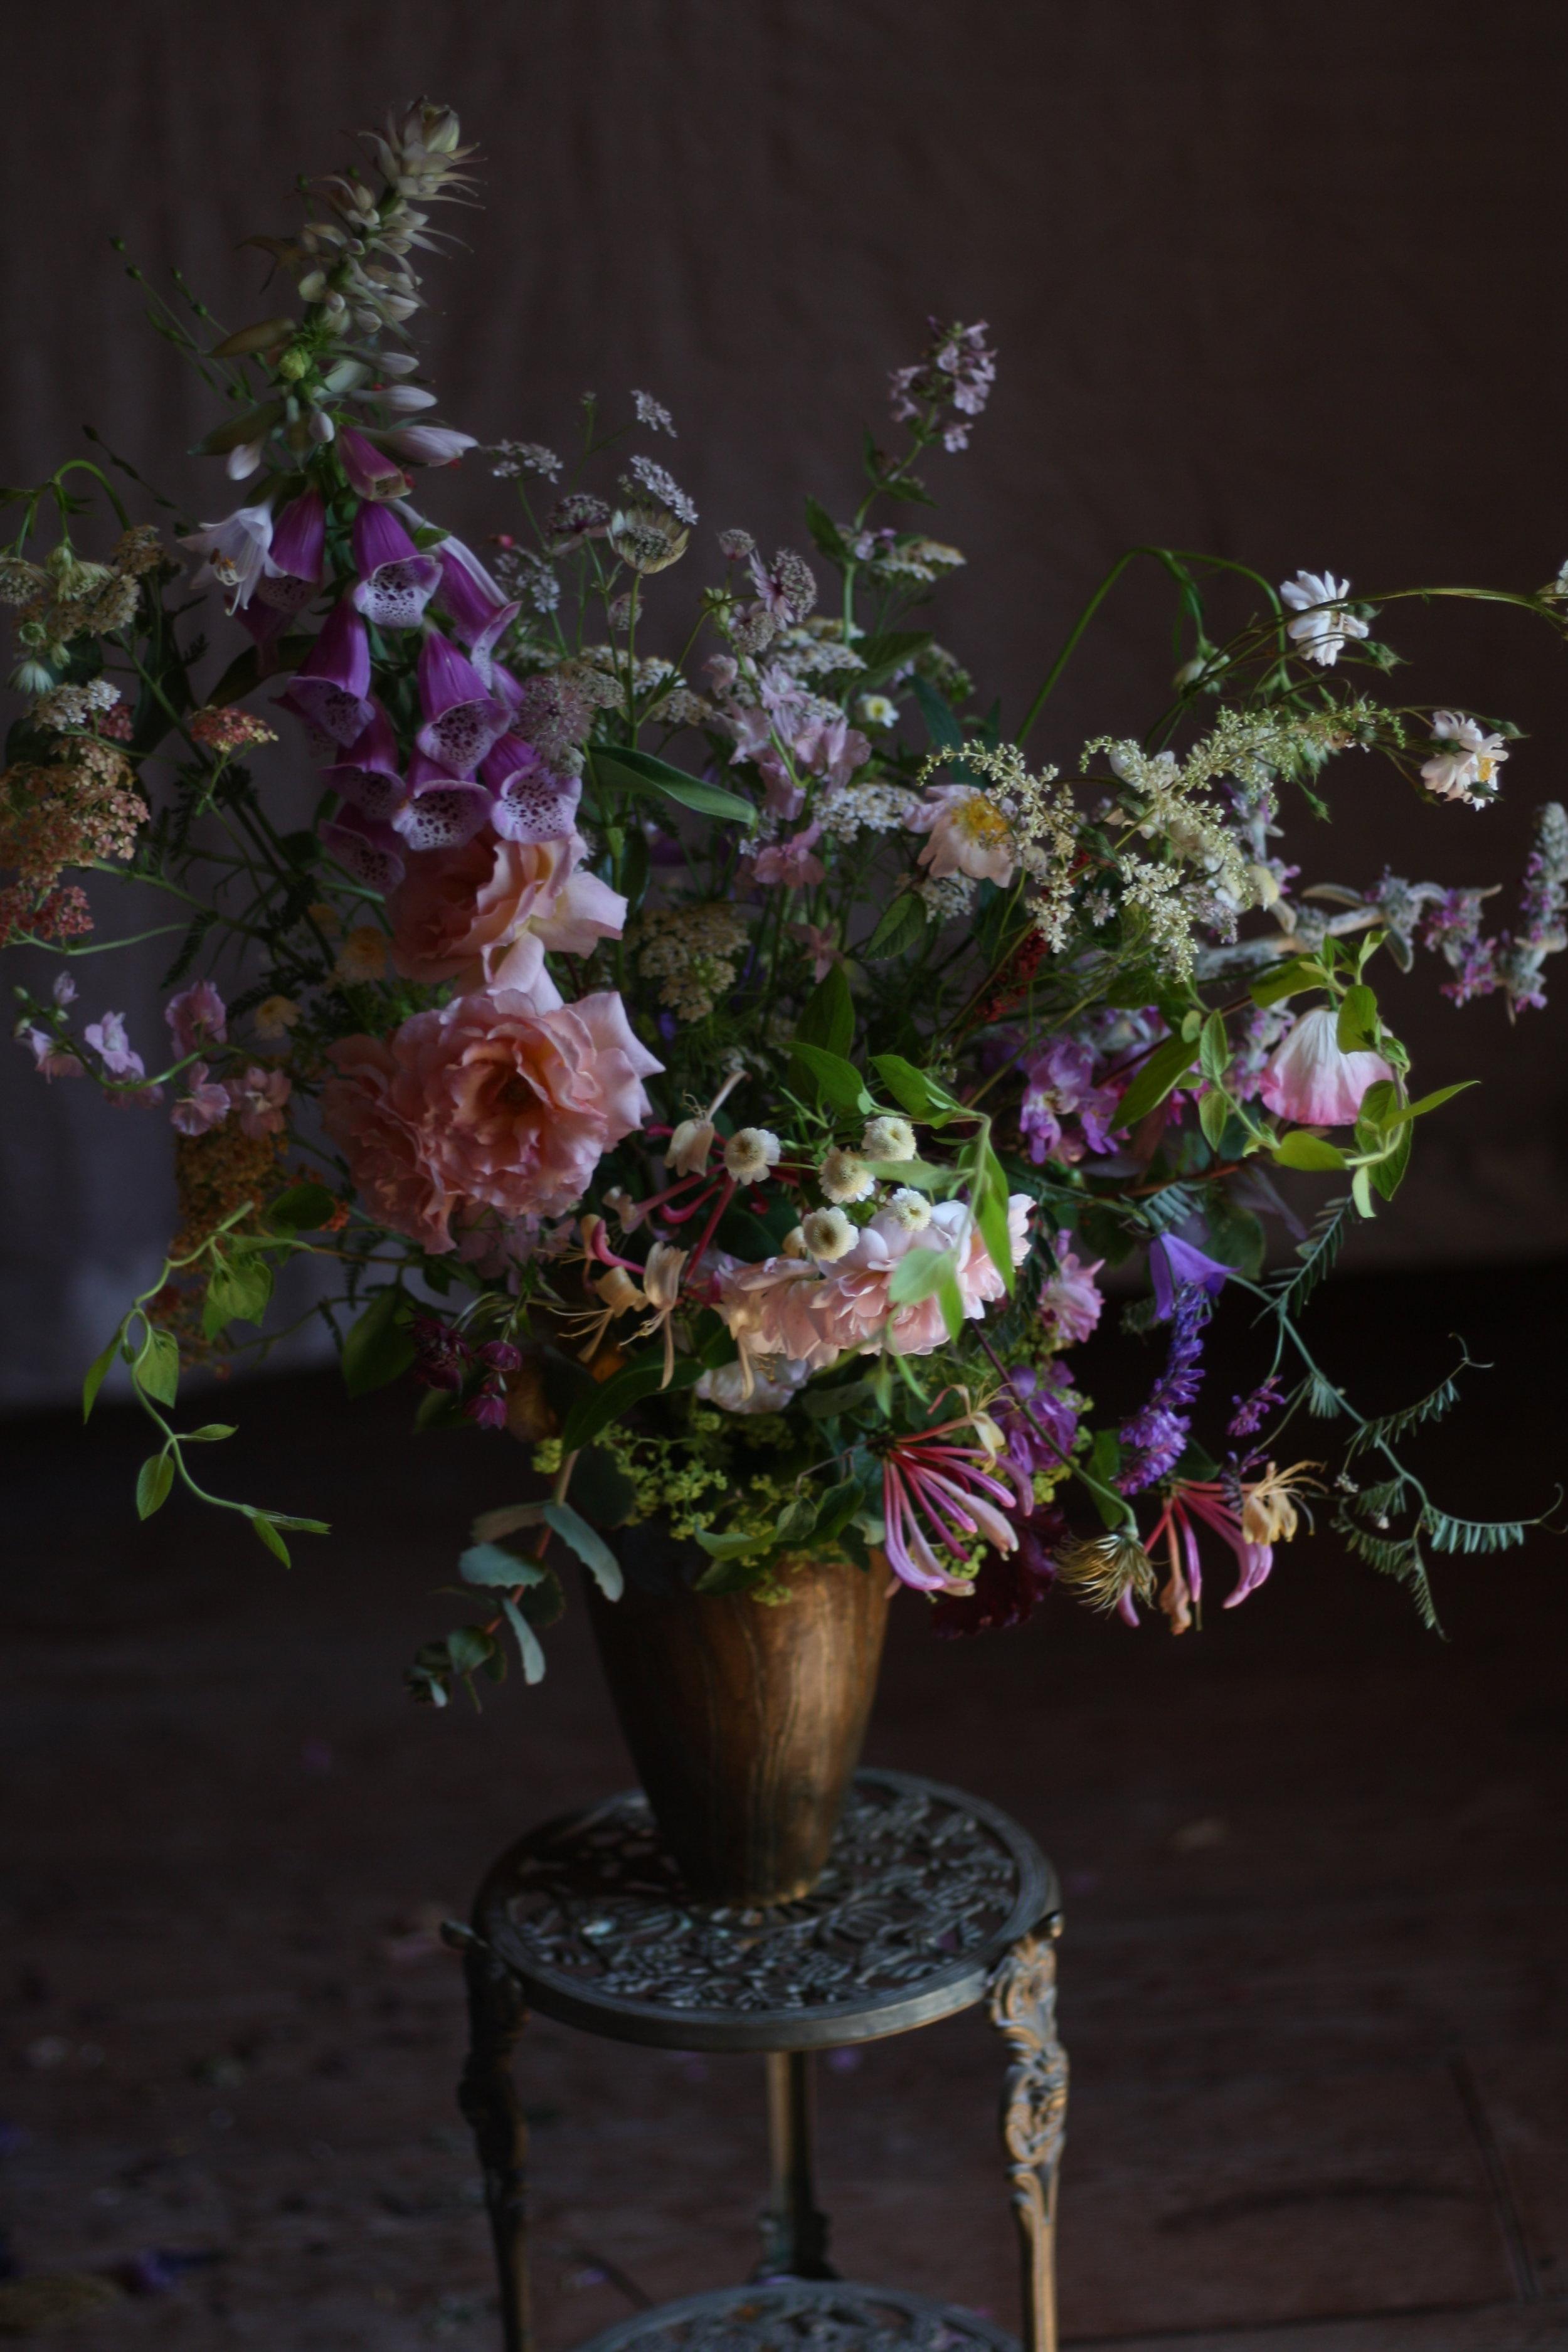 A wild hedgerow floral arrangement, from a Nova Scotian Flower Farm.